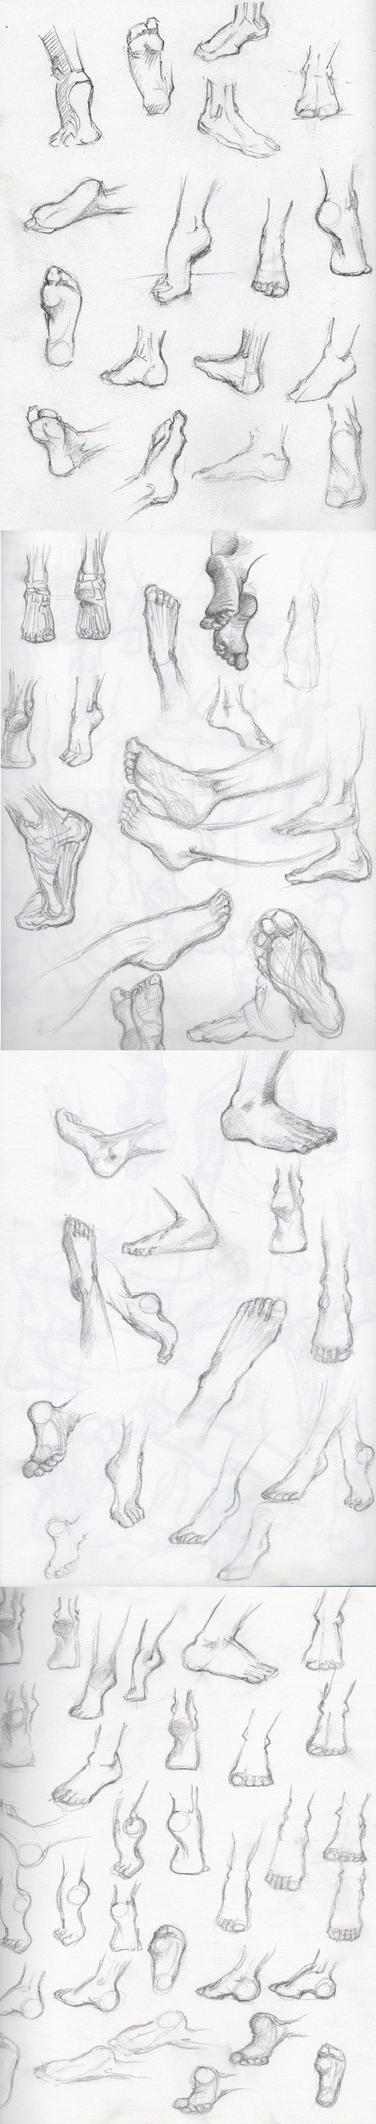 Feet sketches by Cebulaa